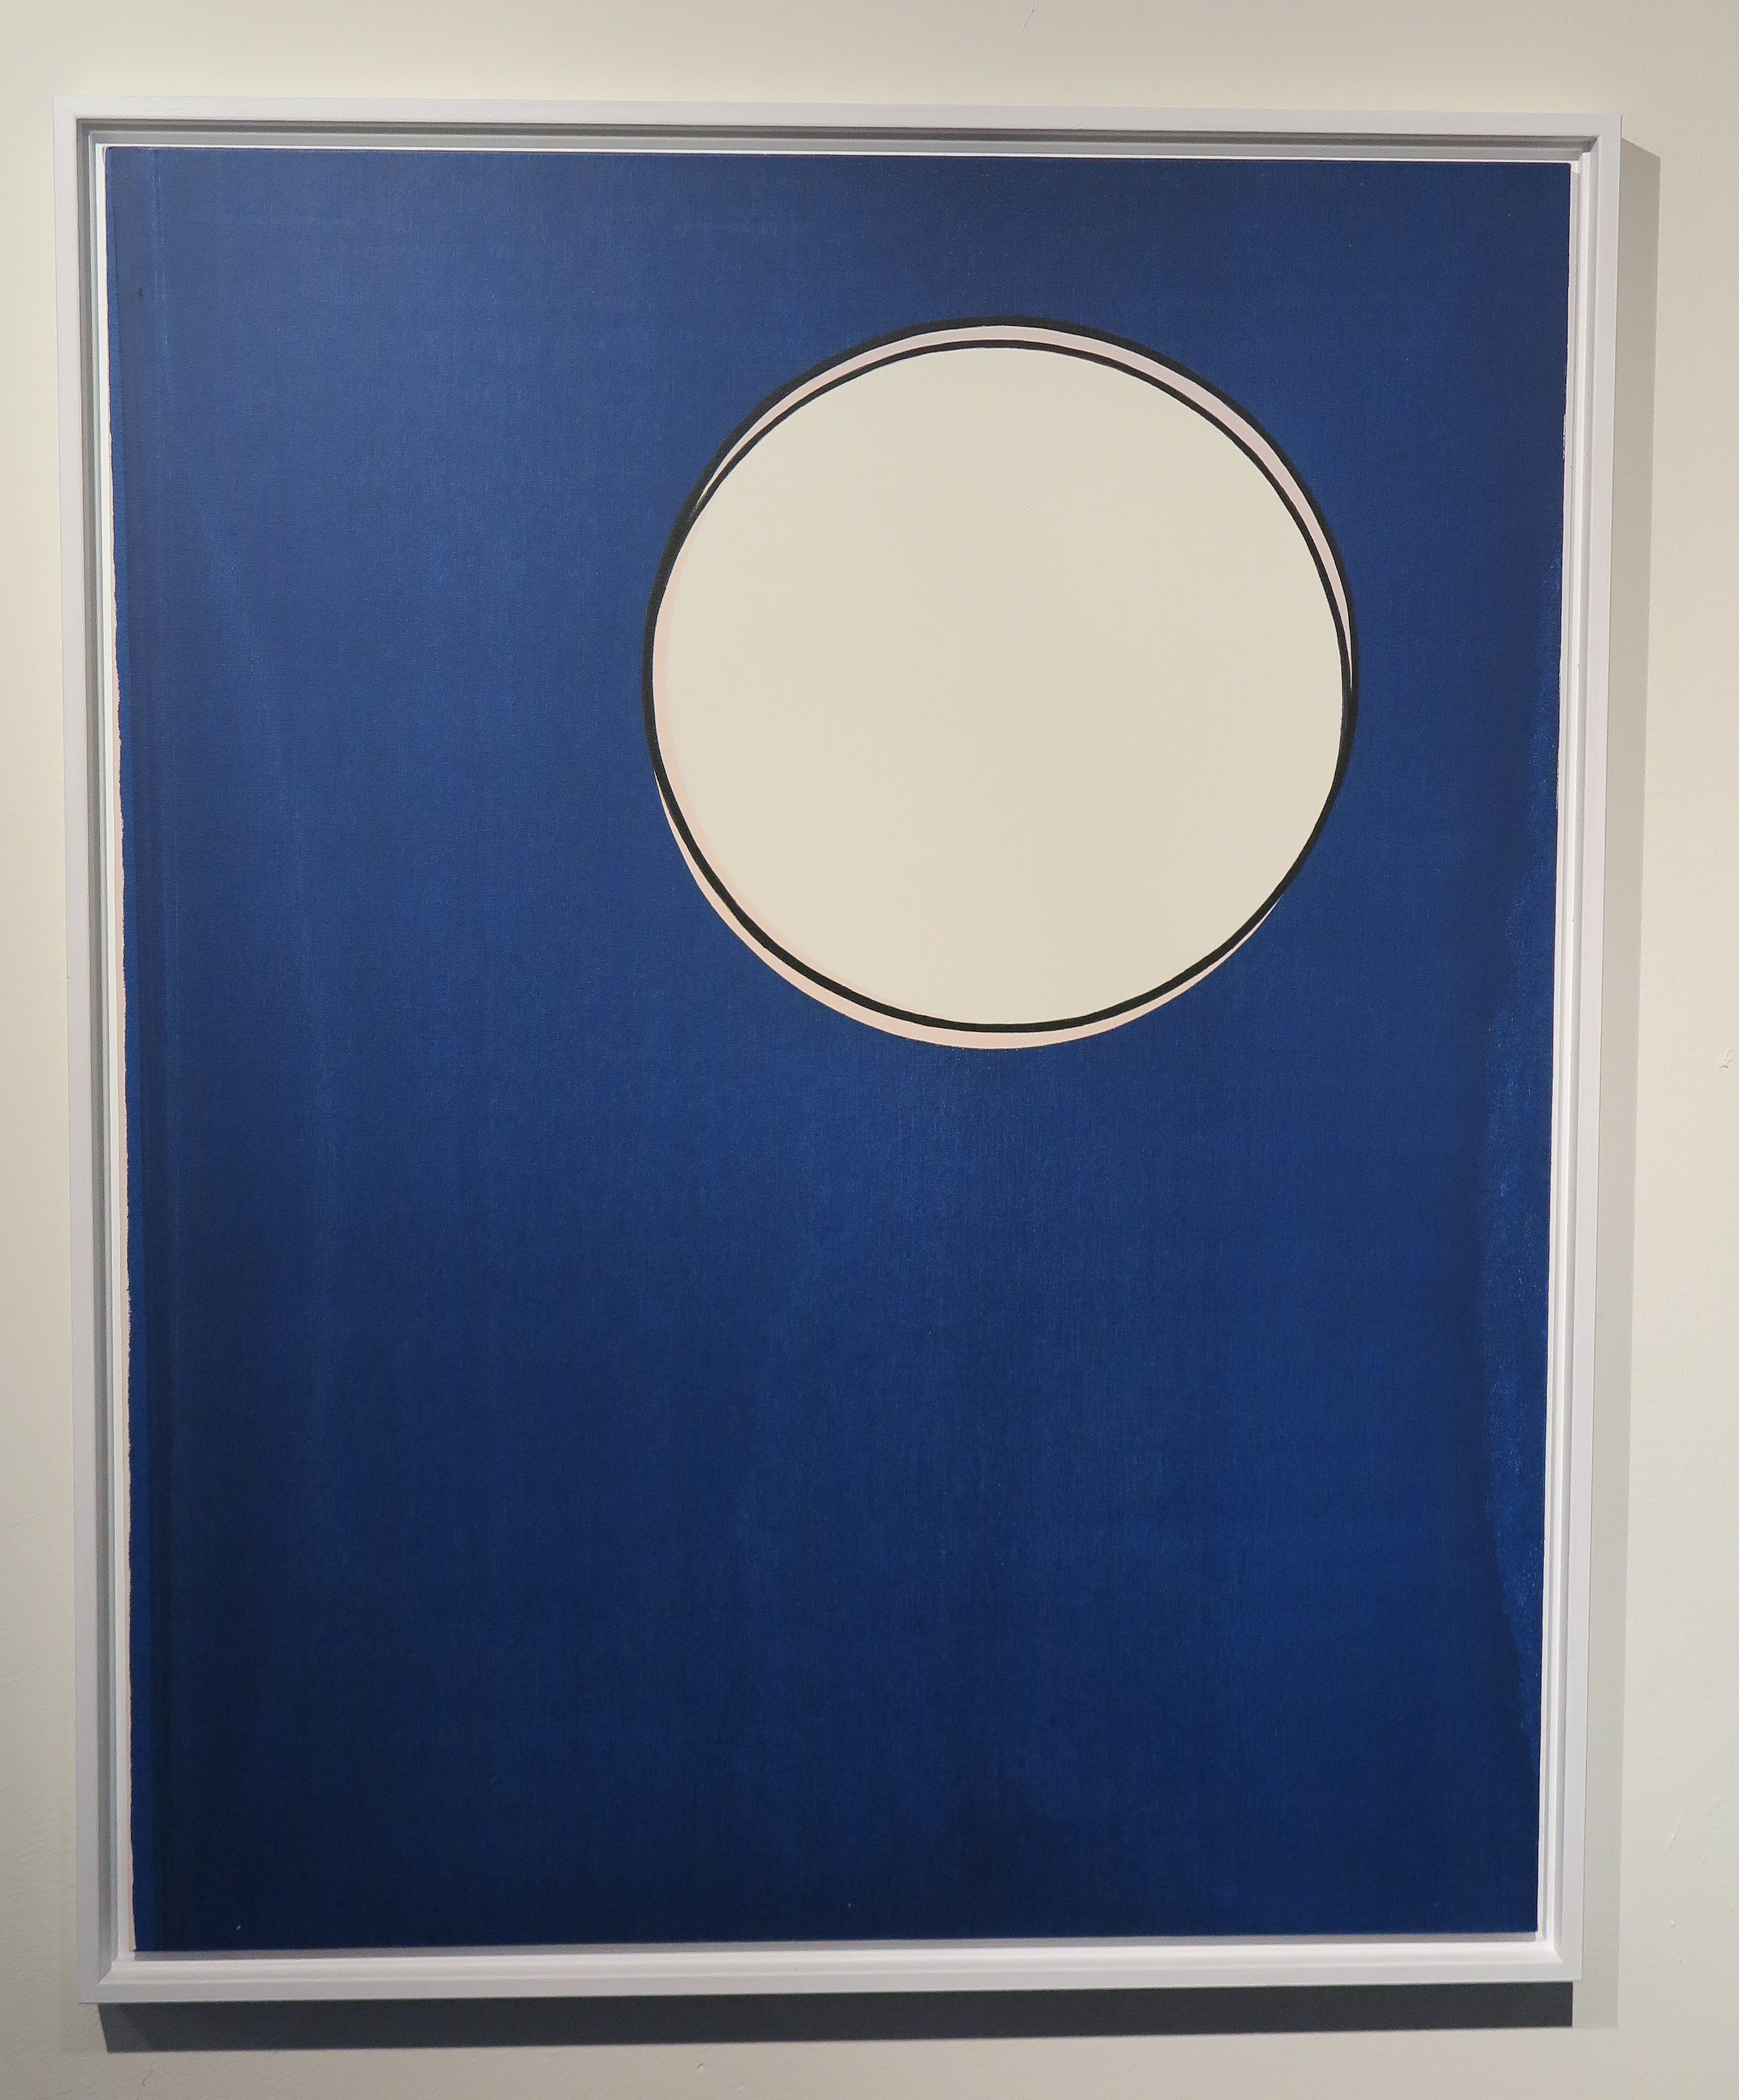 Regenerate #2 - Lieven Hendriks - Misprint moon